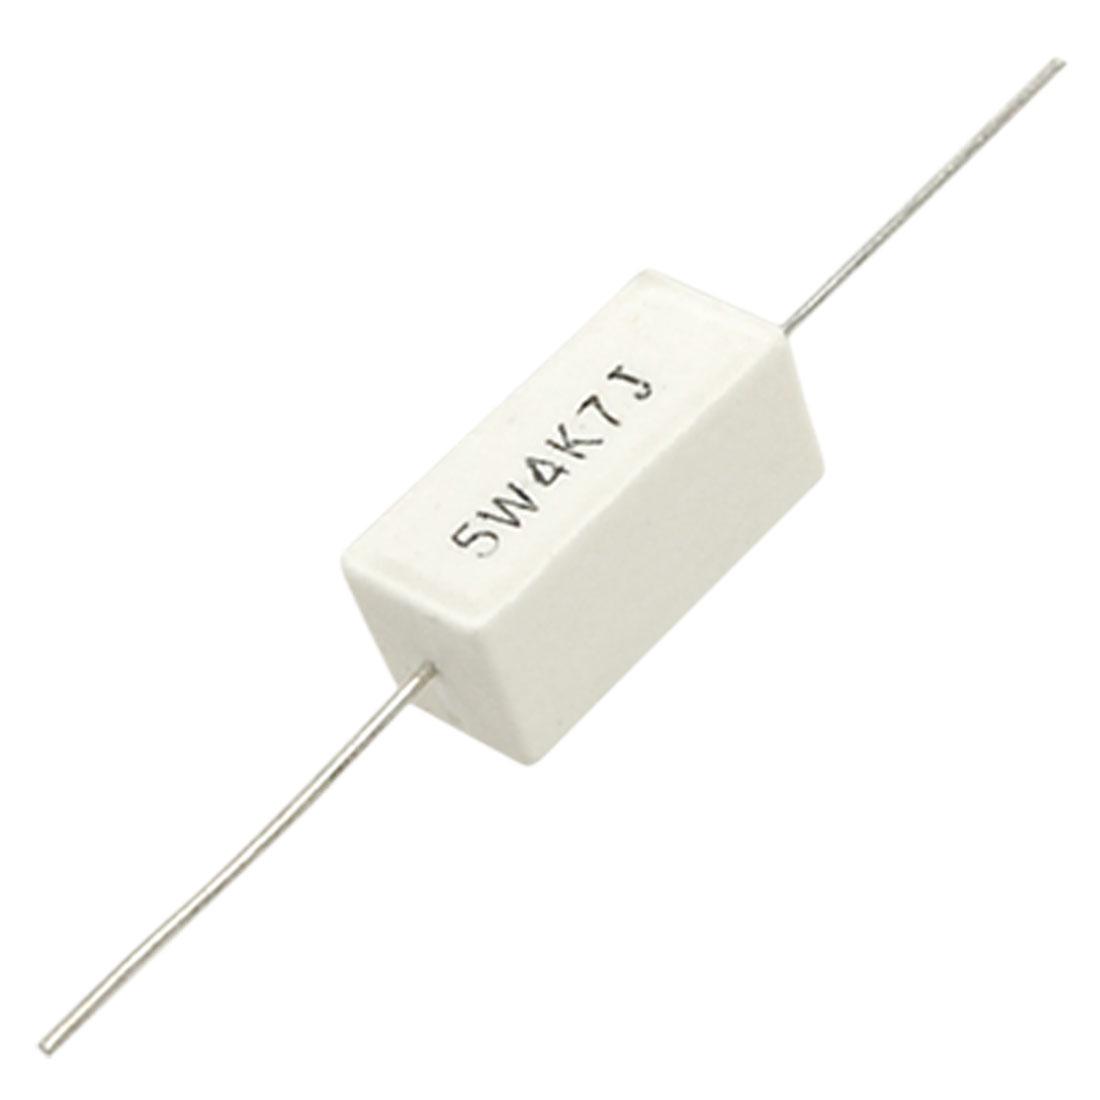 10 Pcs Ceramic Cement Power Resistors 4.7K 4K7 Ohm 5% 5W